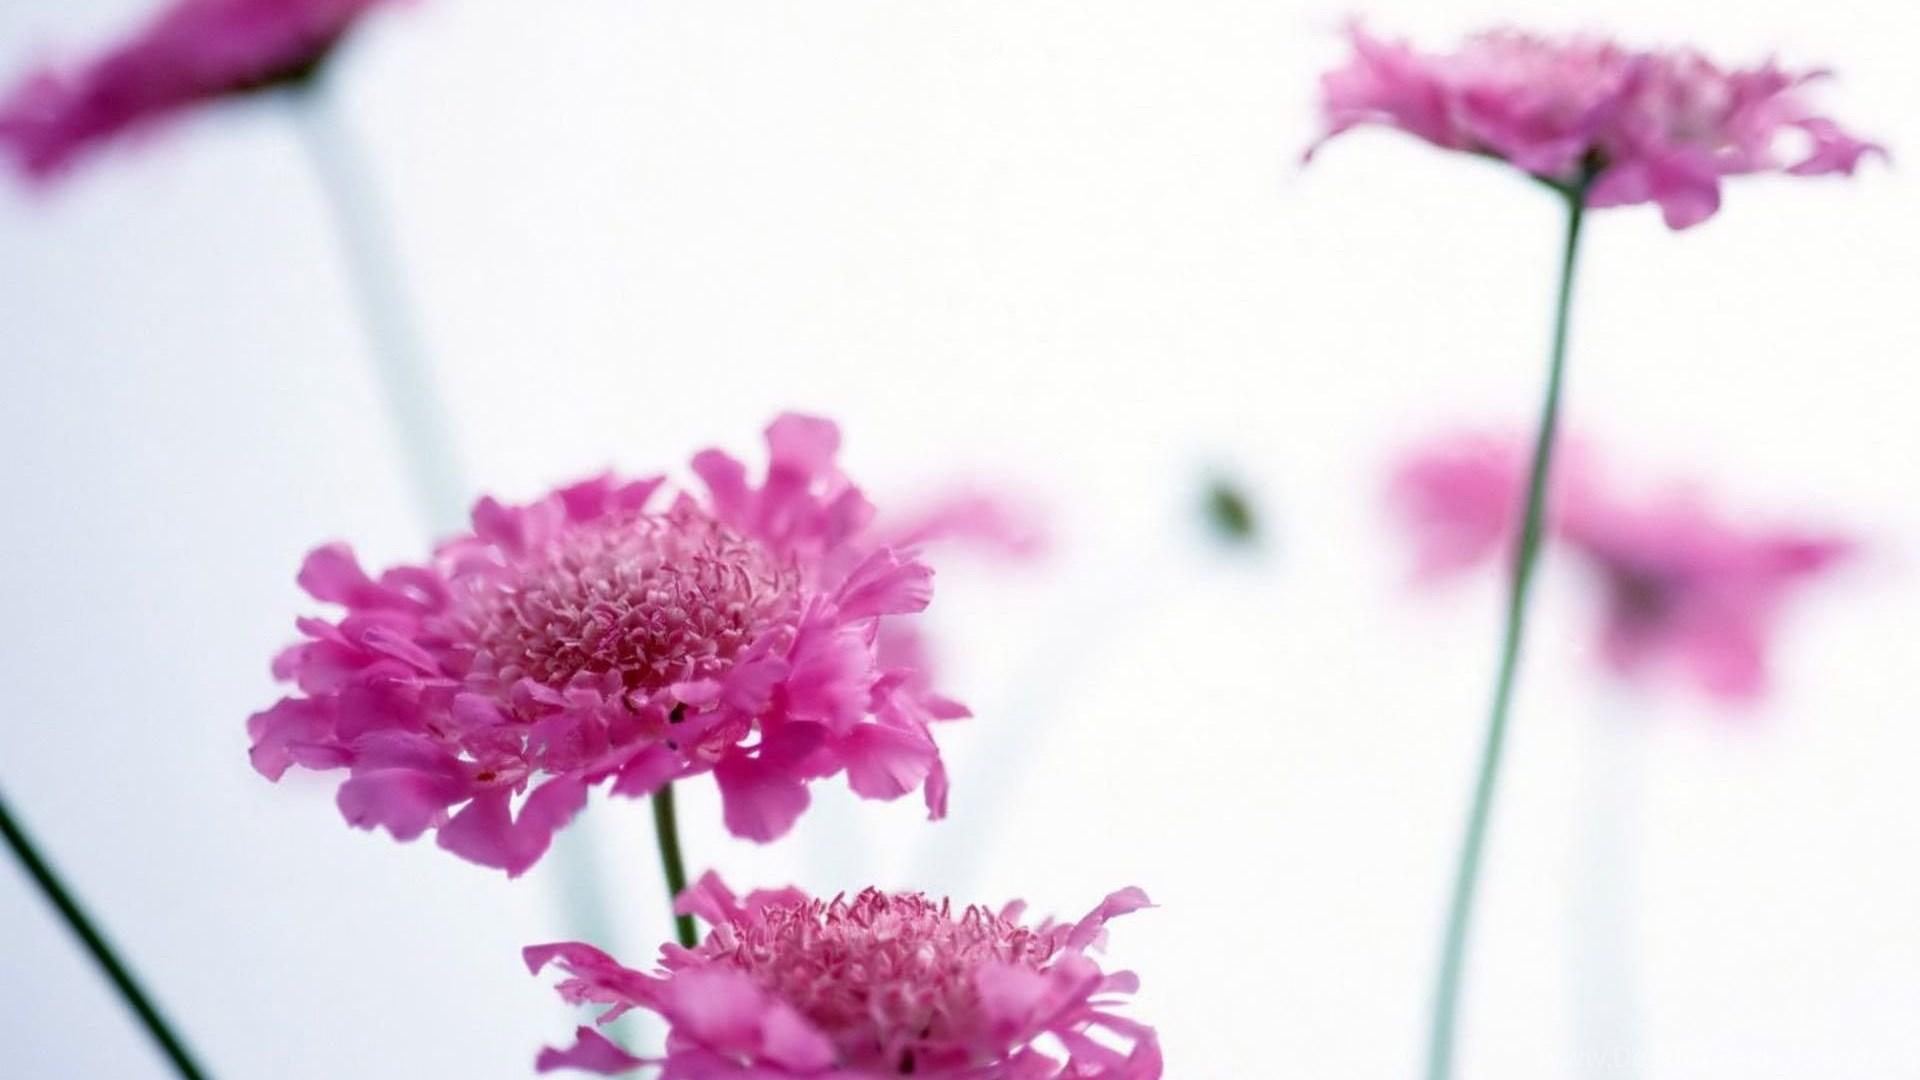 Floral Desktop Wallpapers Hd Wallpapers And Pictures Desktop